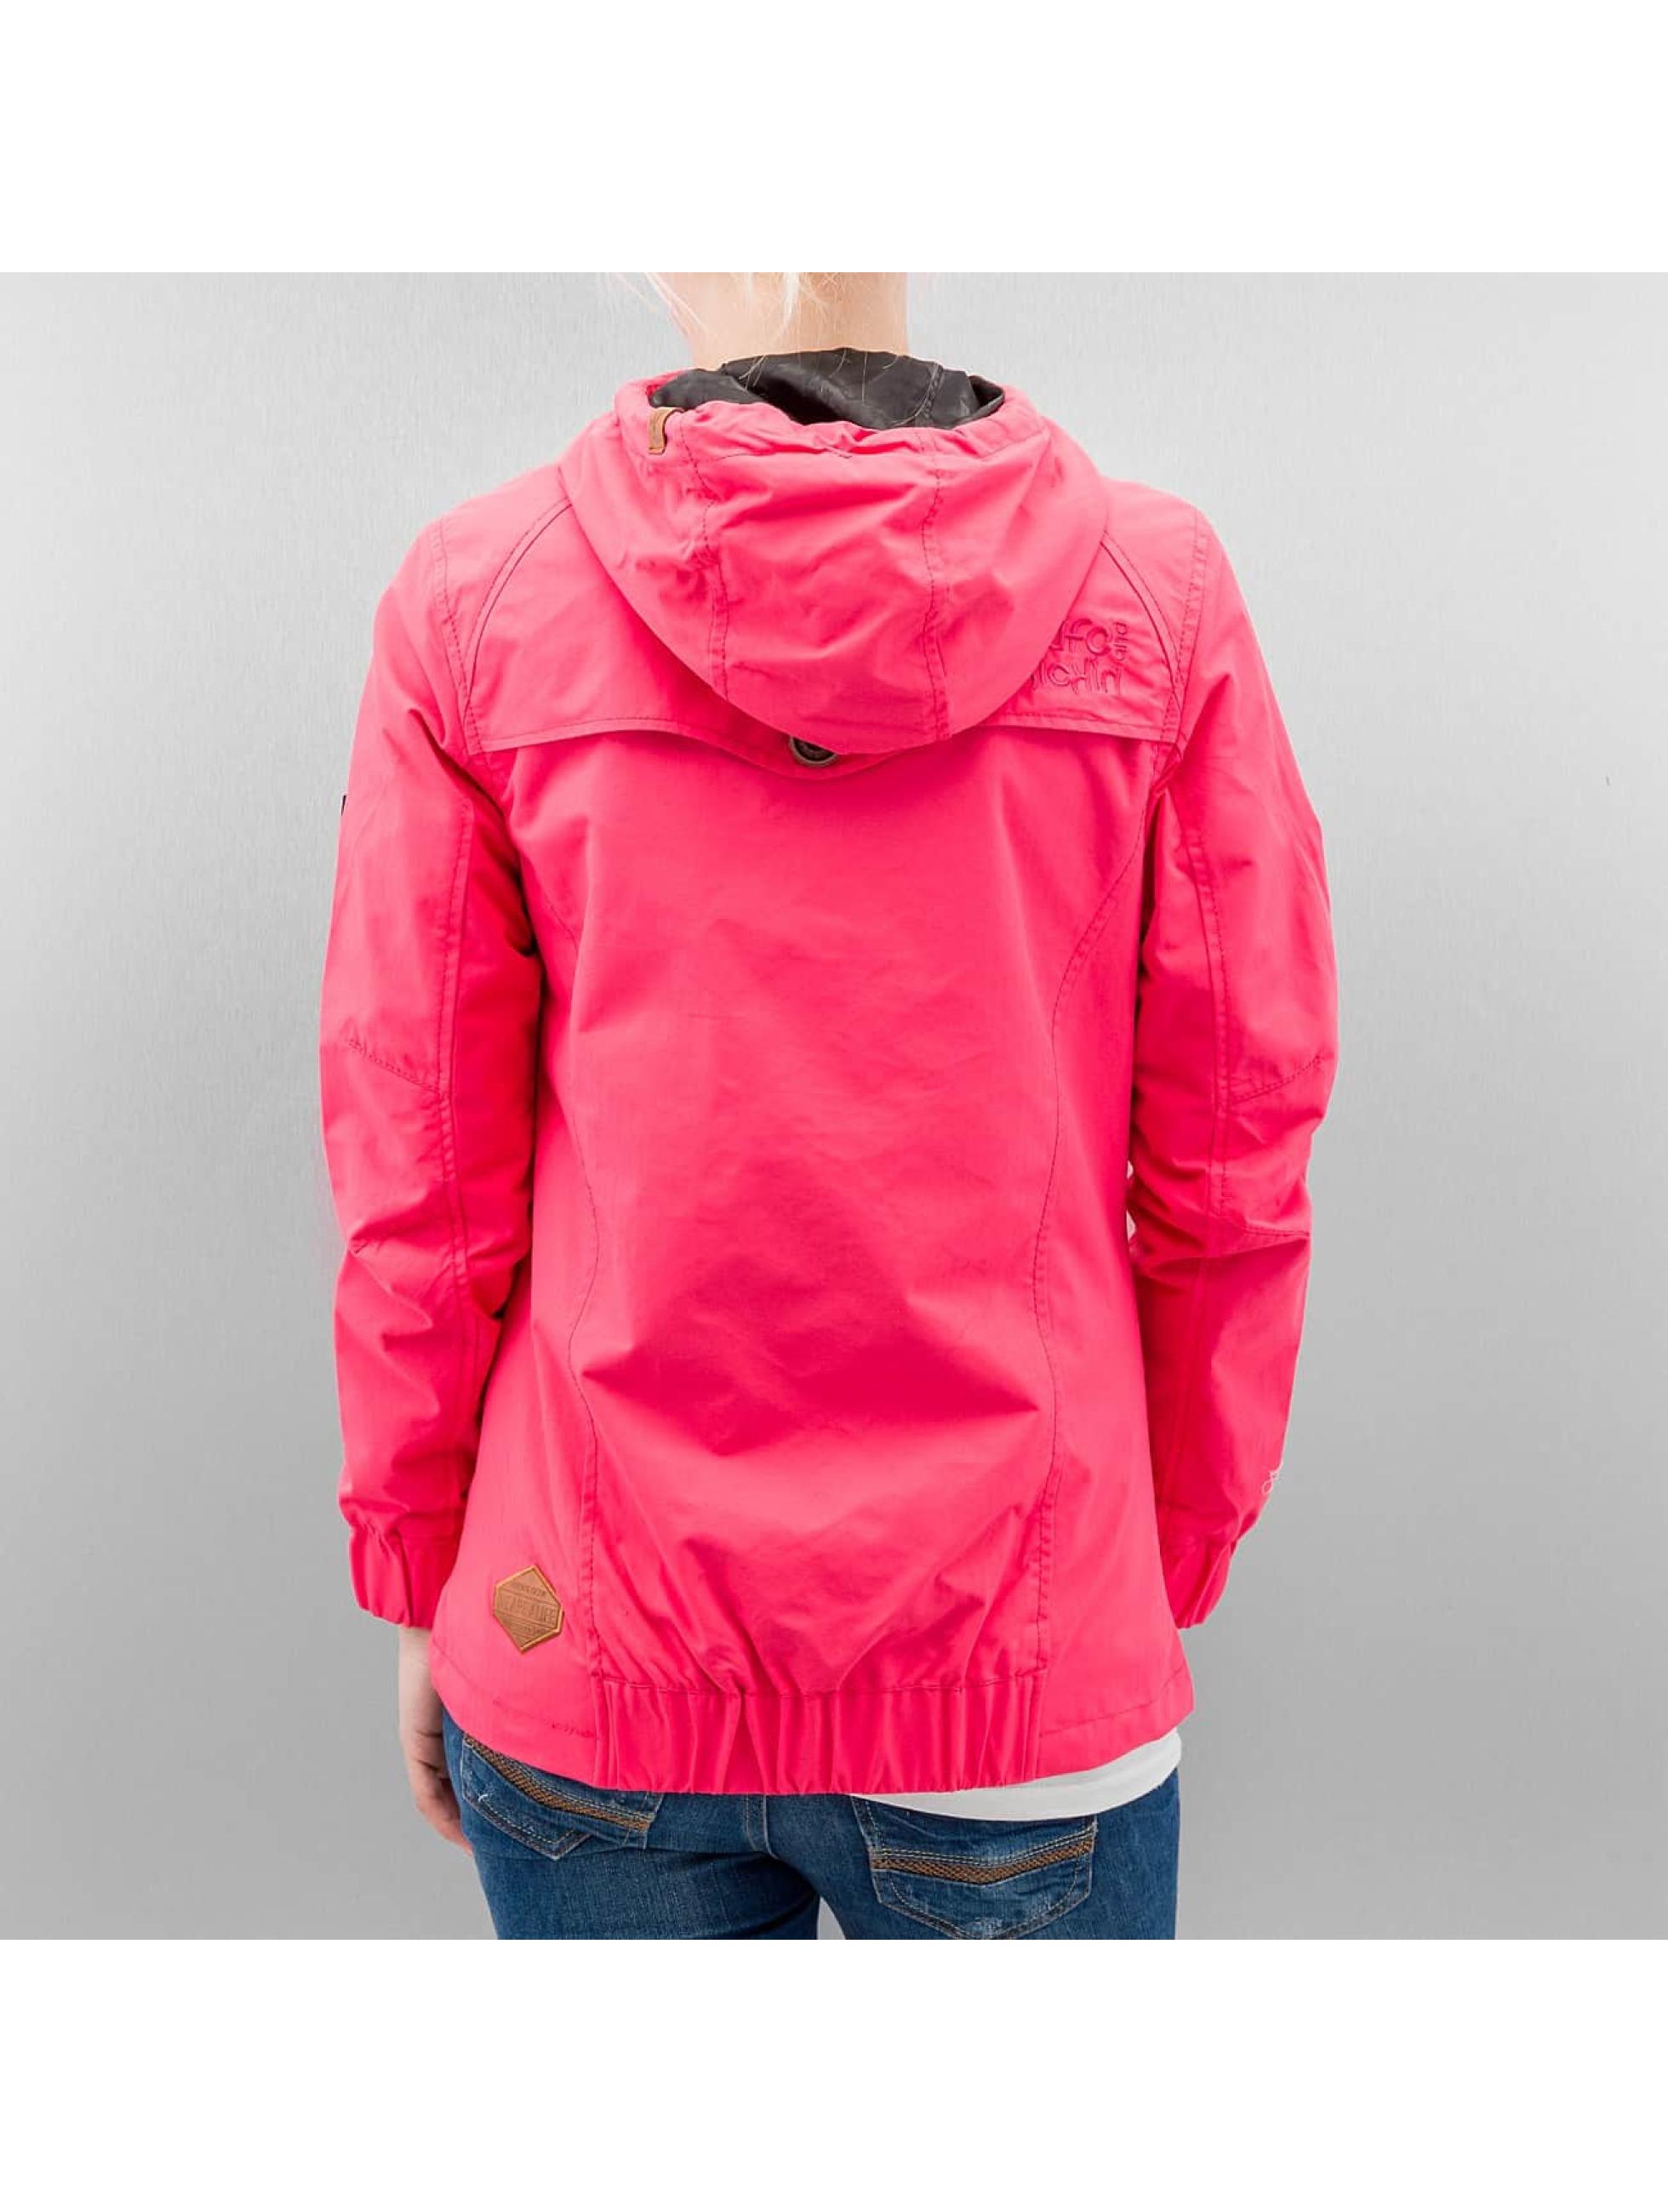 Alife & Kickin Демисезонная куртка Valery лаванда